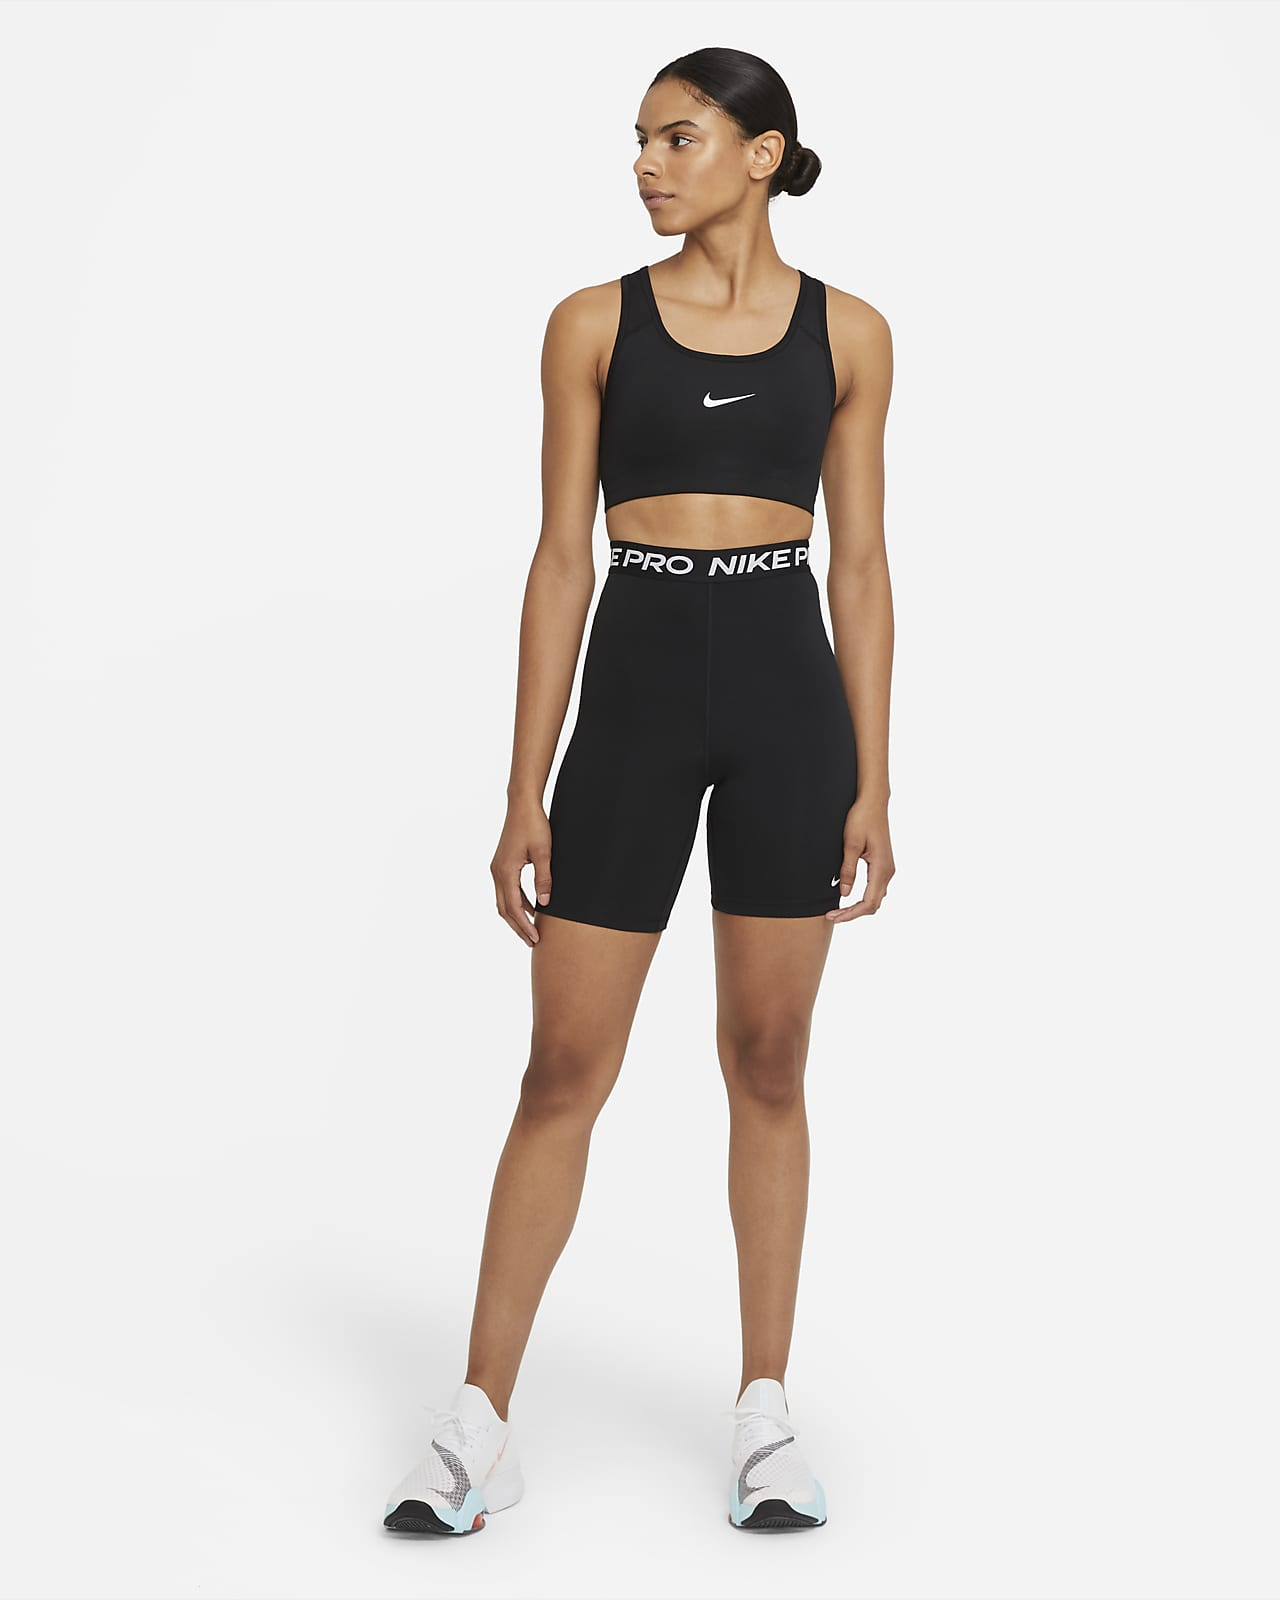 pobreza sufrimiento Dentro  Nike Pro 365 Women's High-Rise 18cm (approx.) Shorts. Nike GB